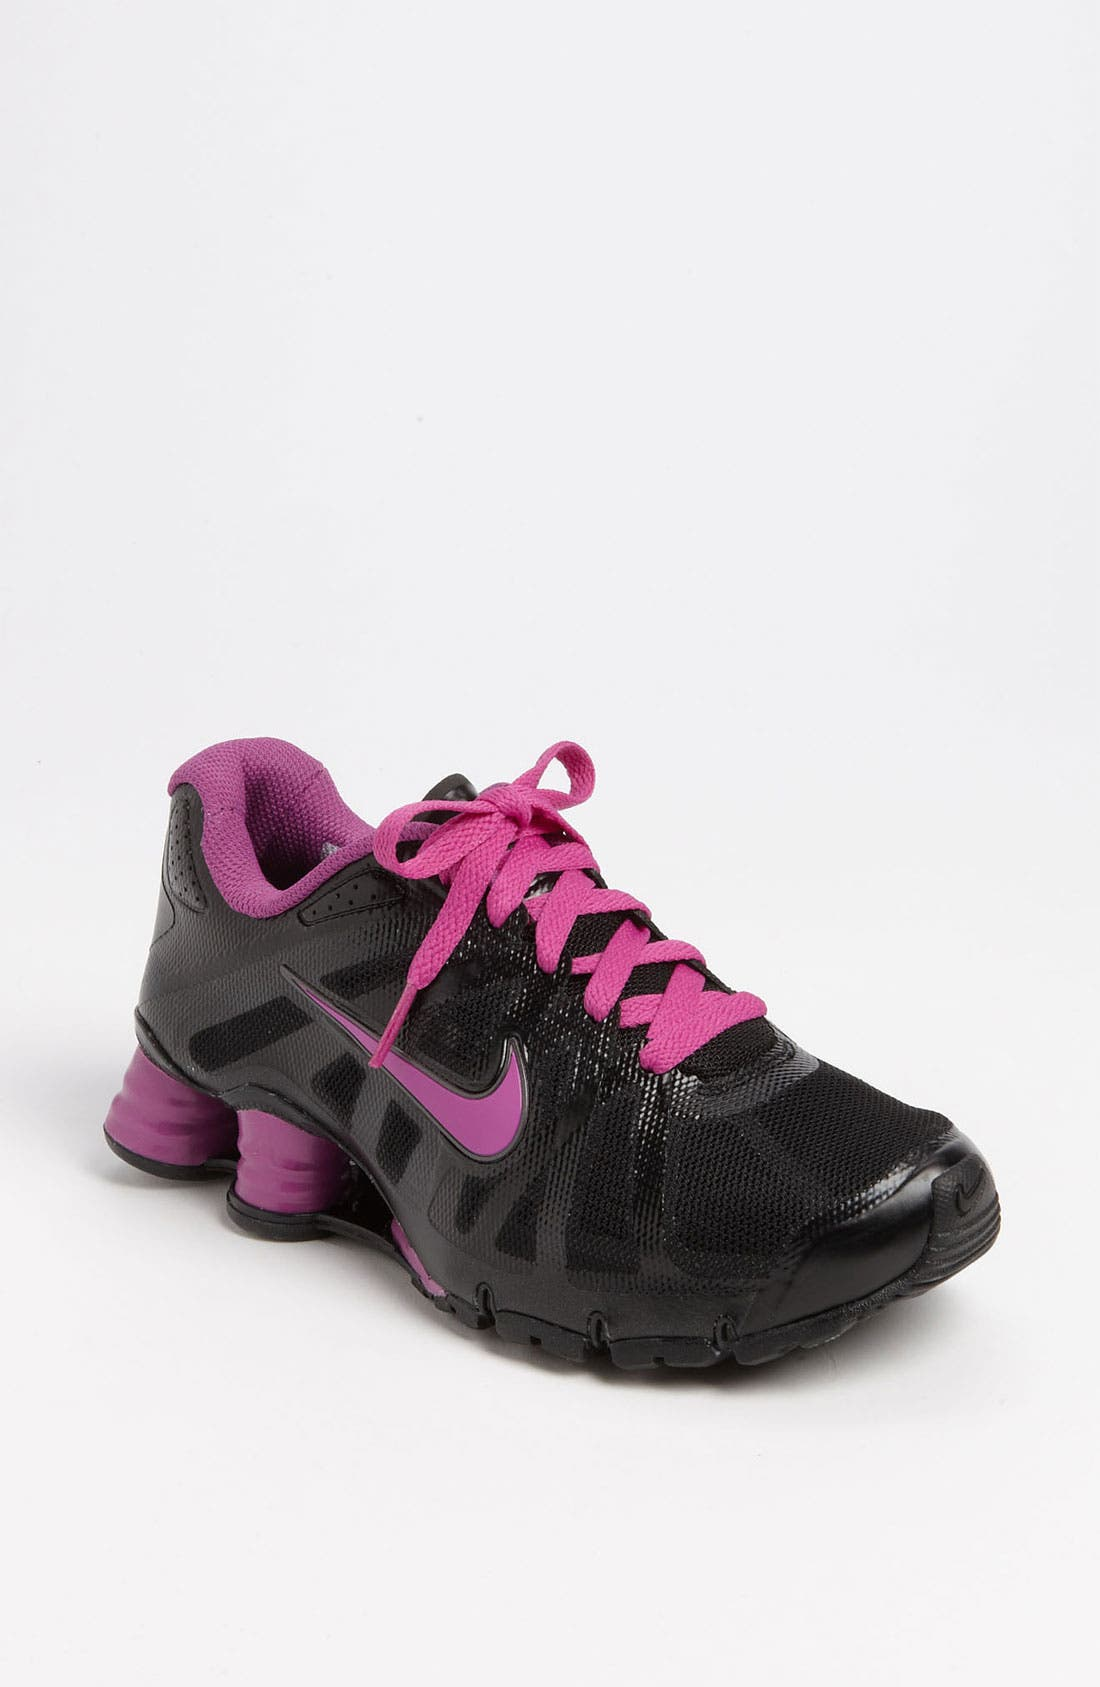 Alternate Image 1 Selected - Nike 'Shox Roadster' Running Shoe (Women) (Exclusive)